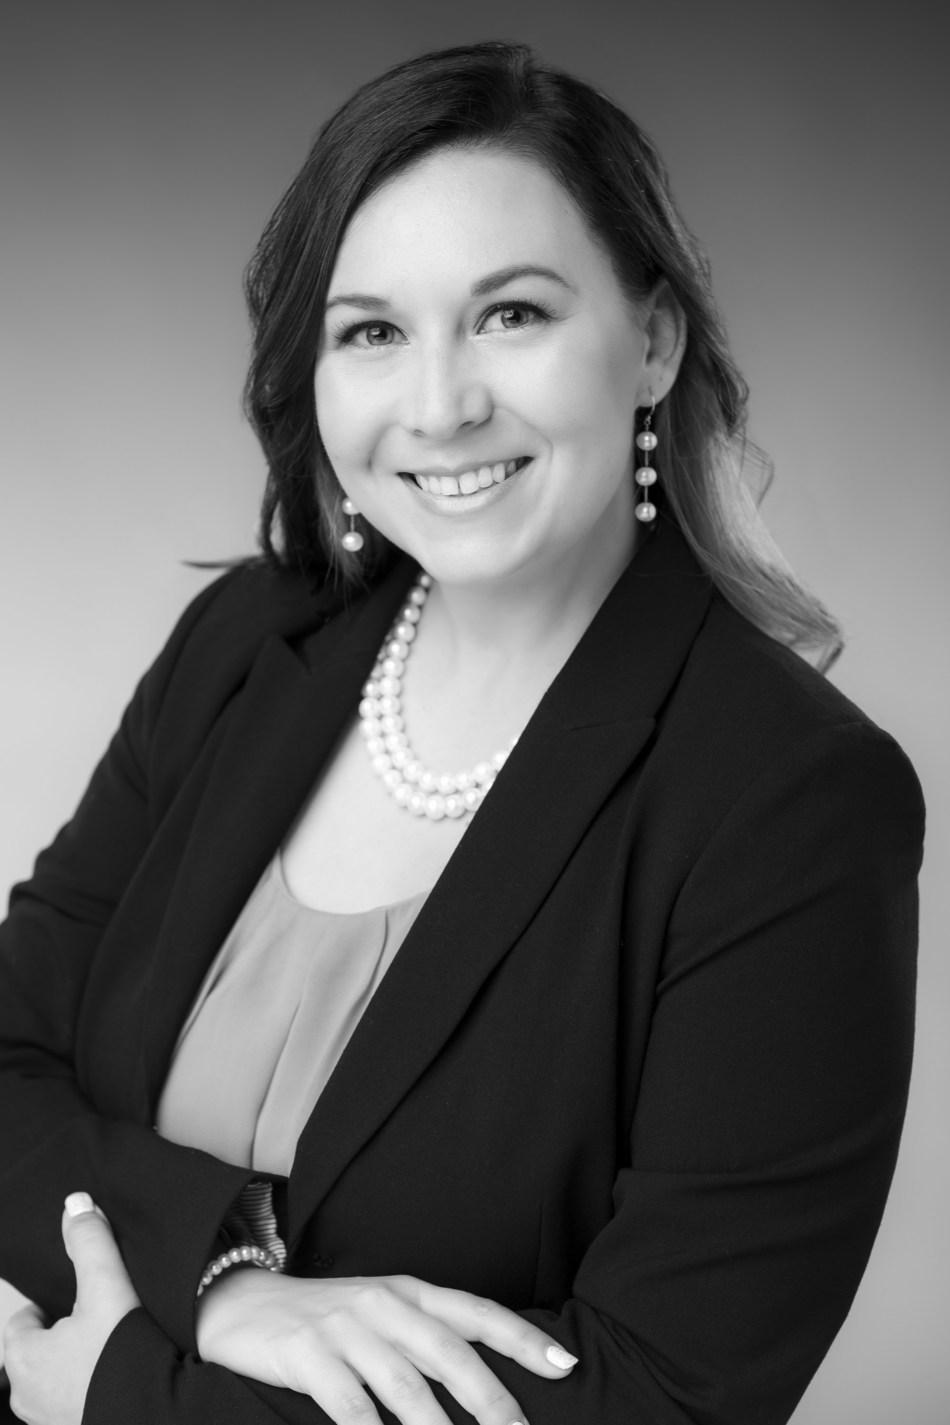 Dr. Ashley Brenton